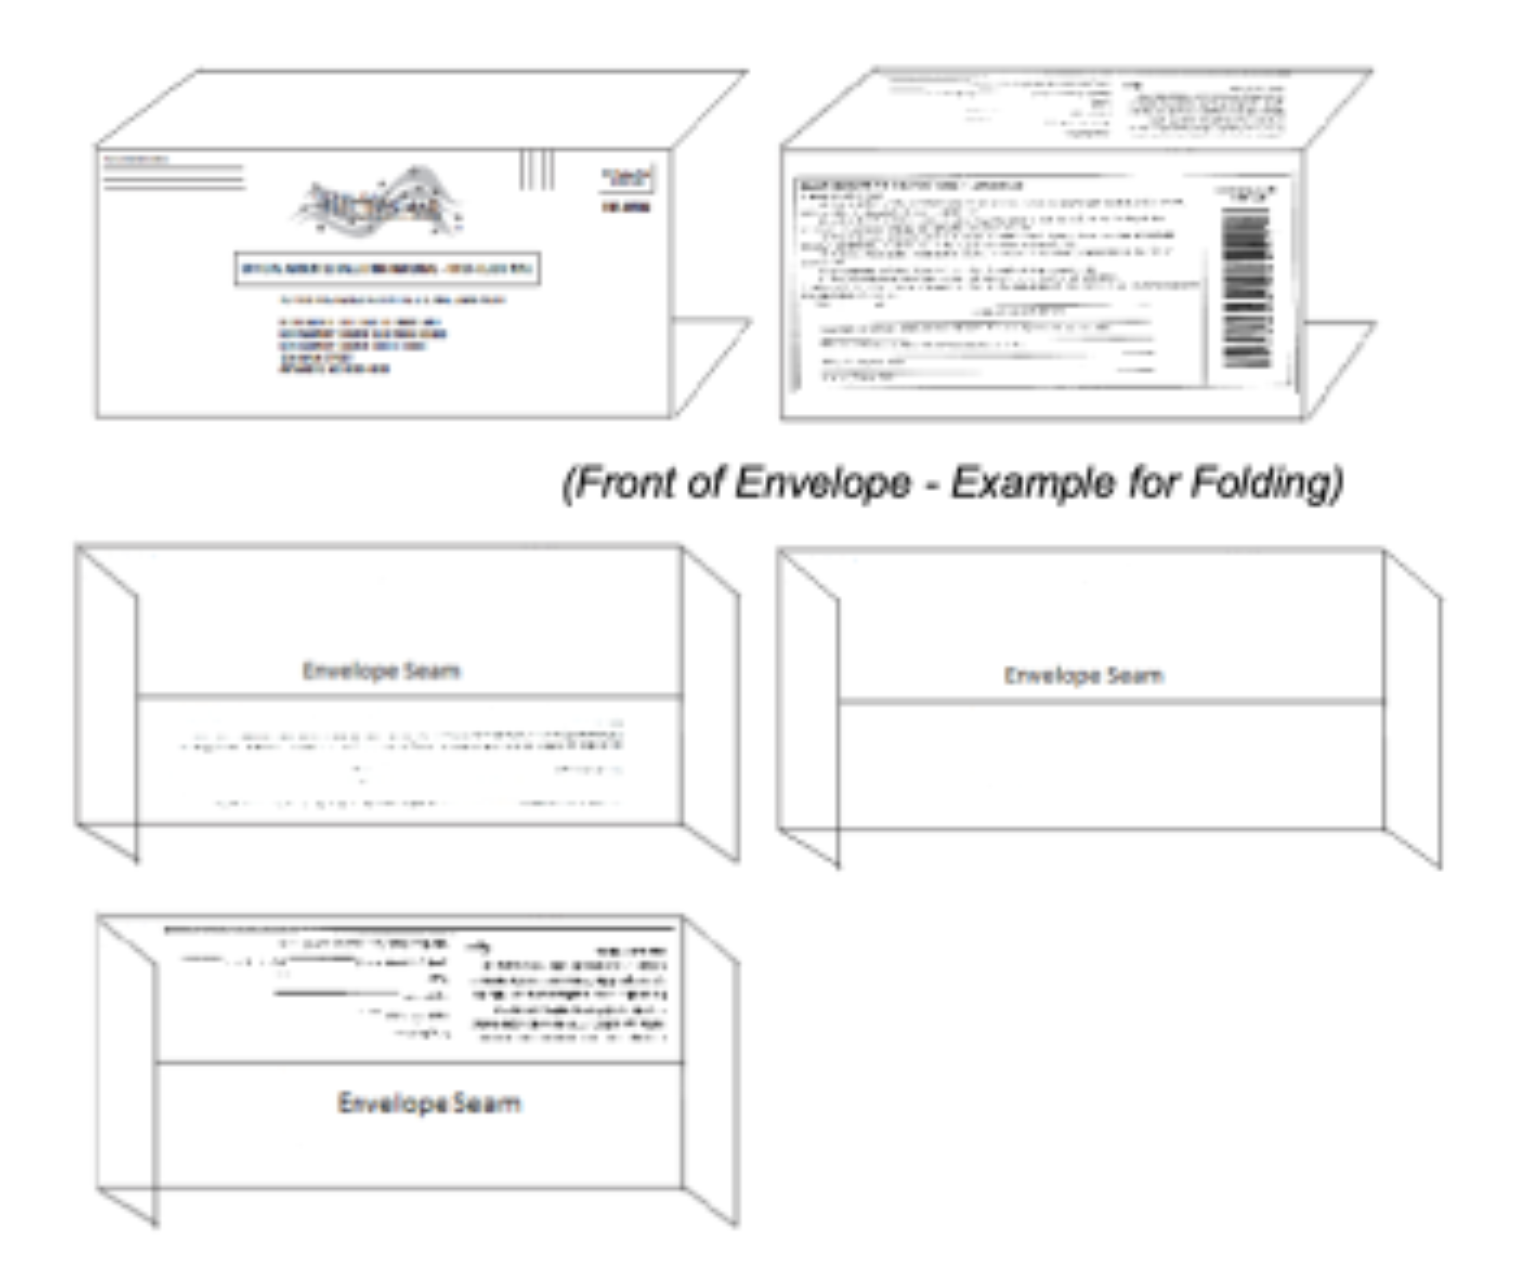 Folding instructions for NY State envelope